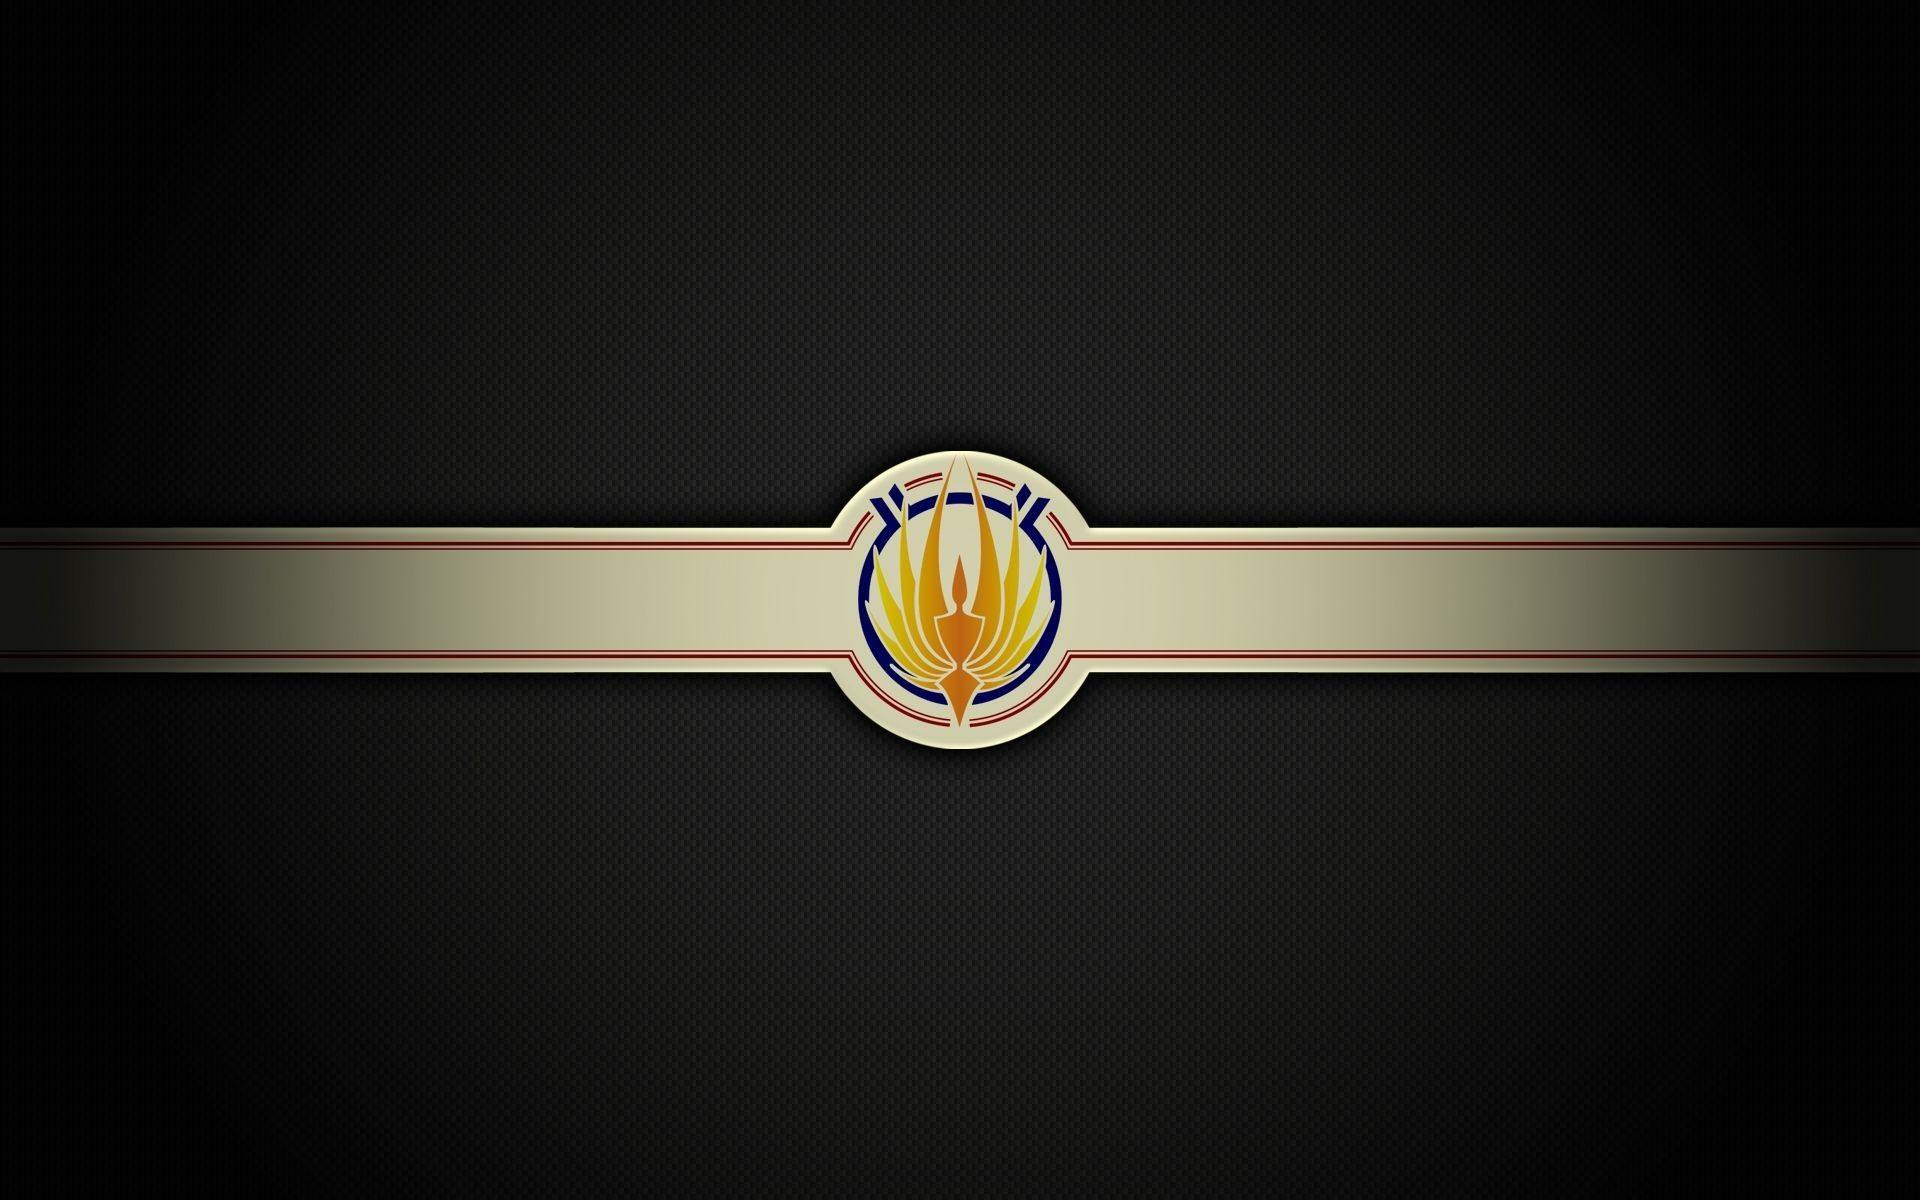 Colonial Logo Background Cool Art : Full HD desktop wallpaper .